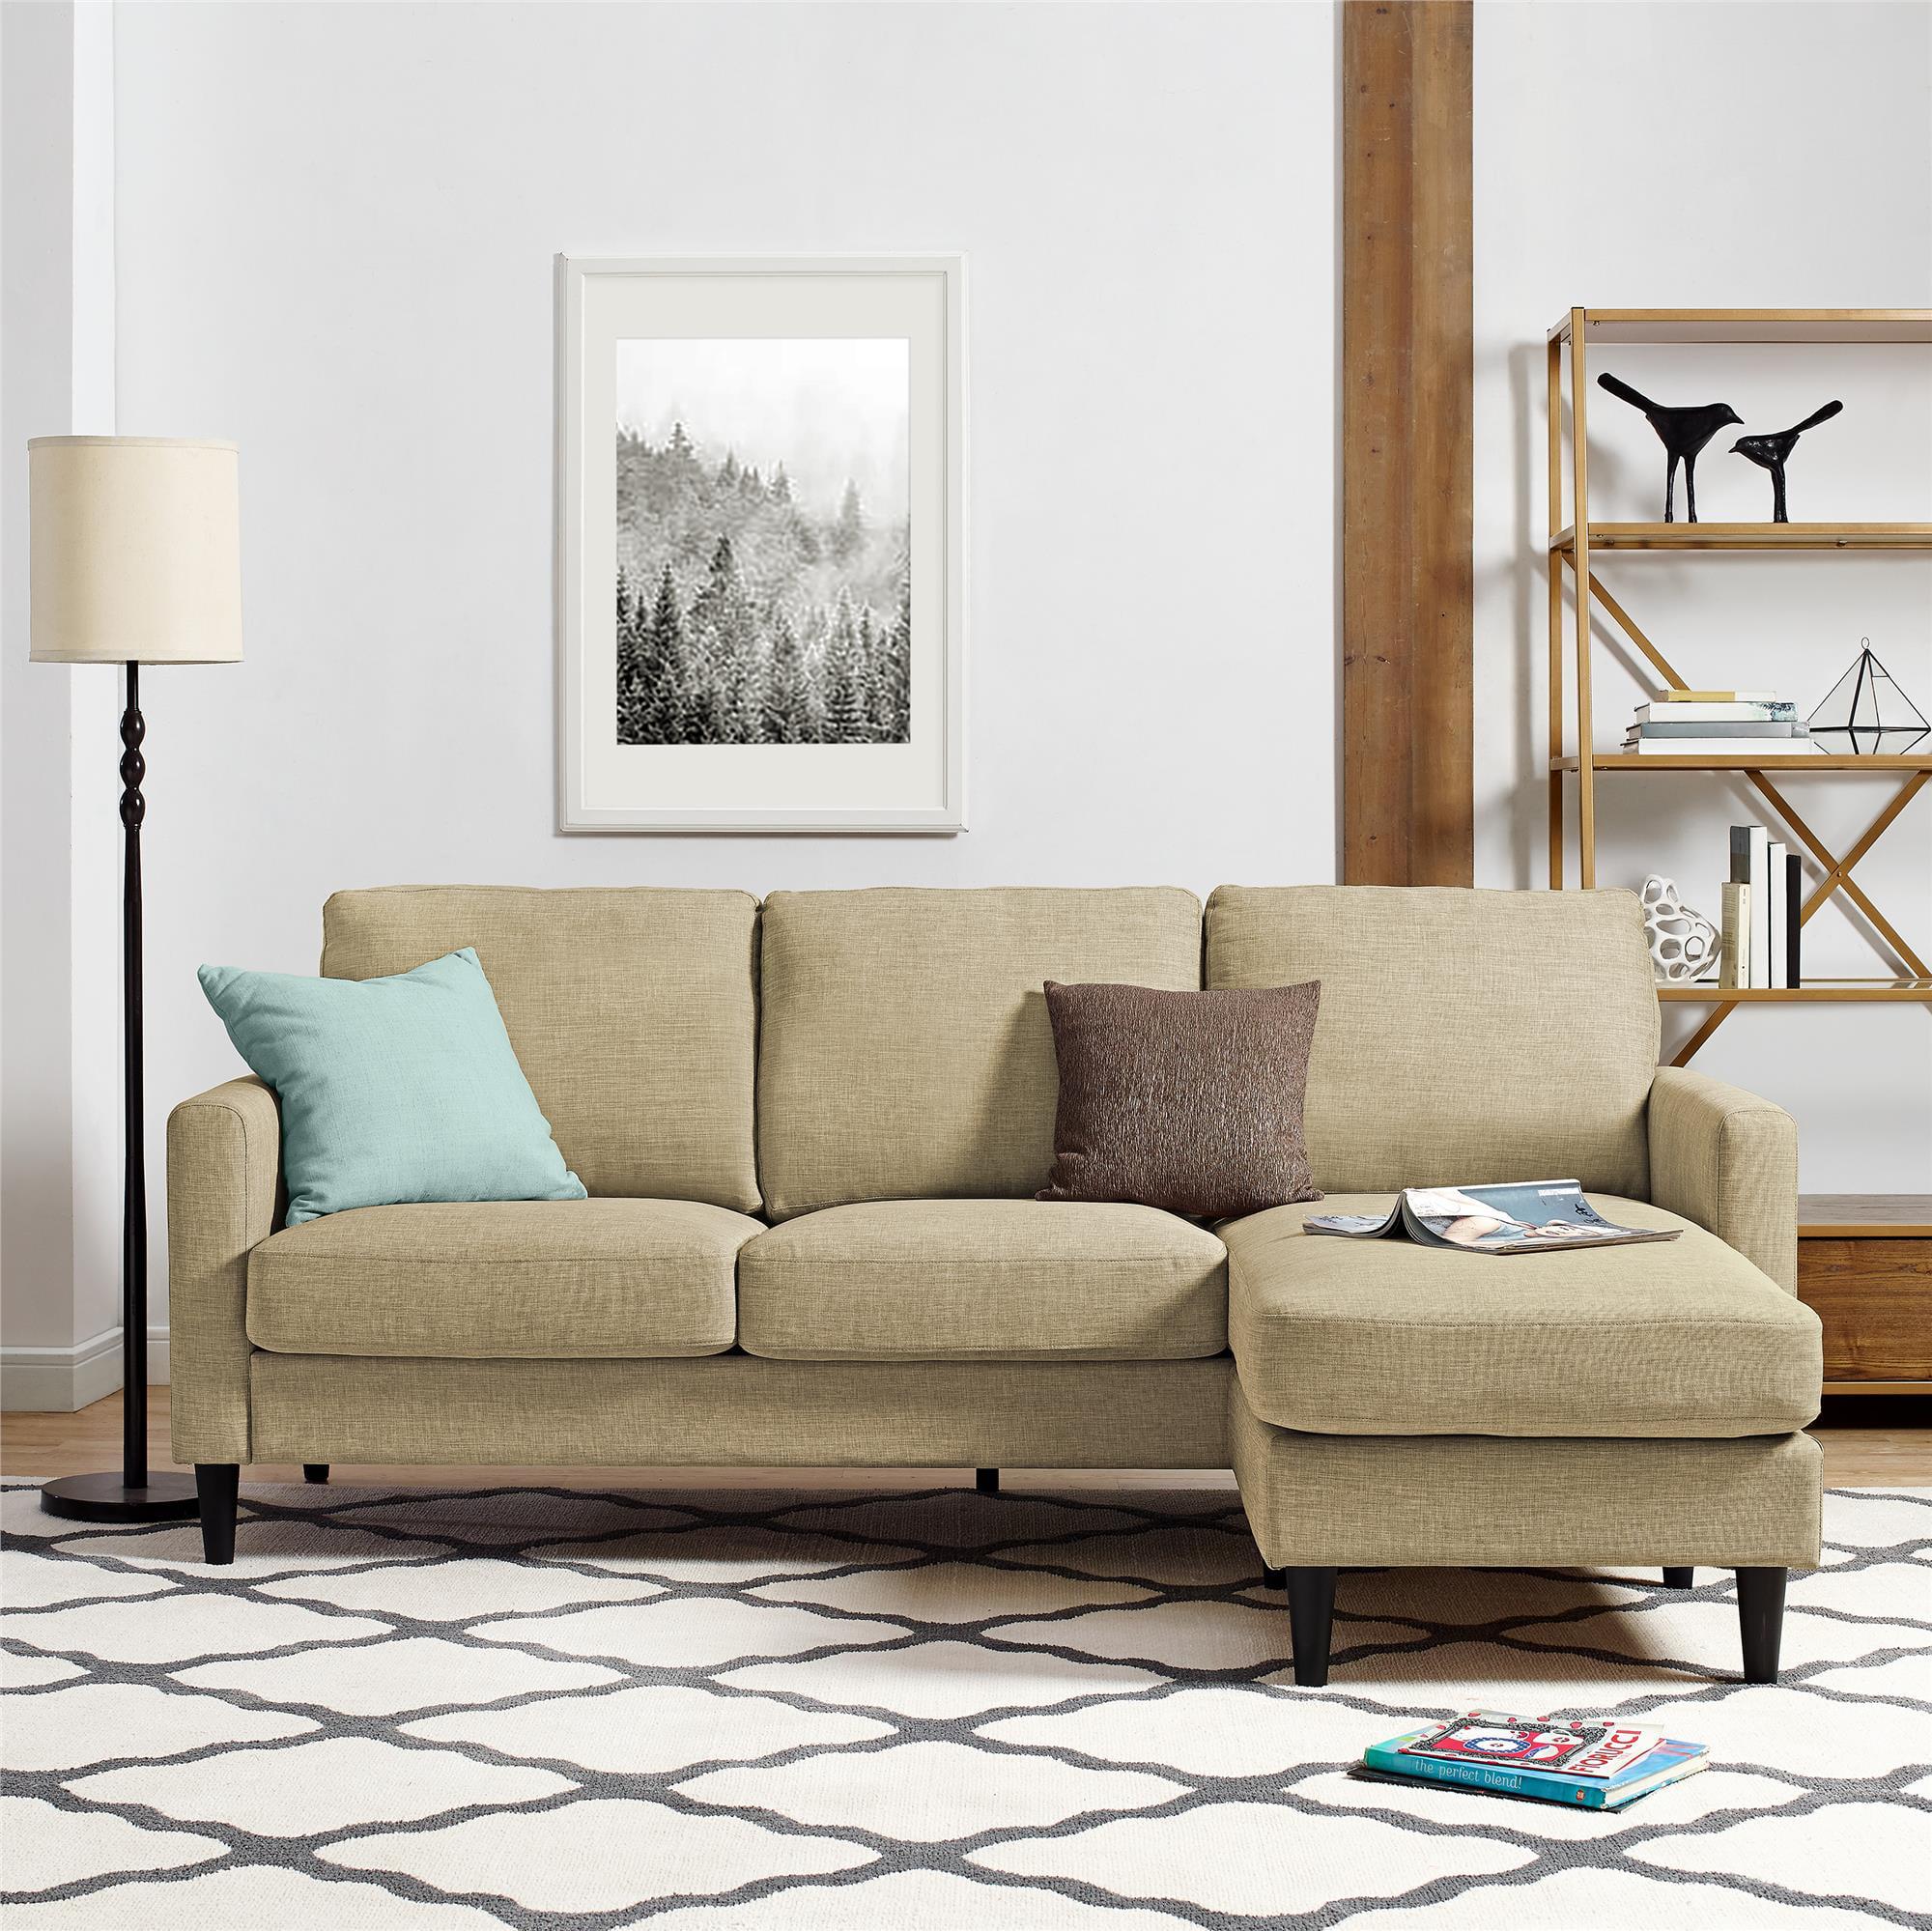 Dorel Living Kaci Sectional, Reversible, Multiple Colors